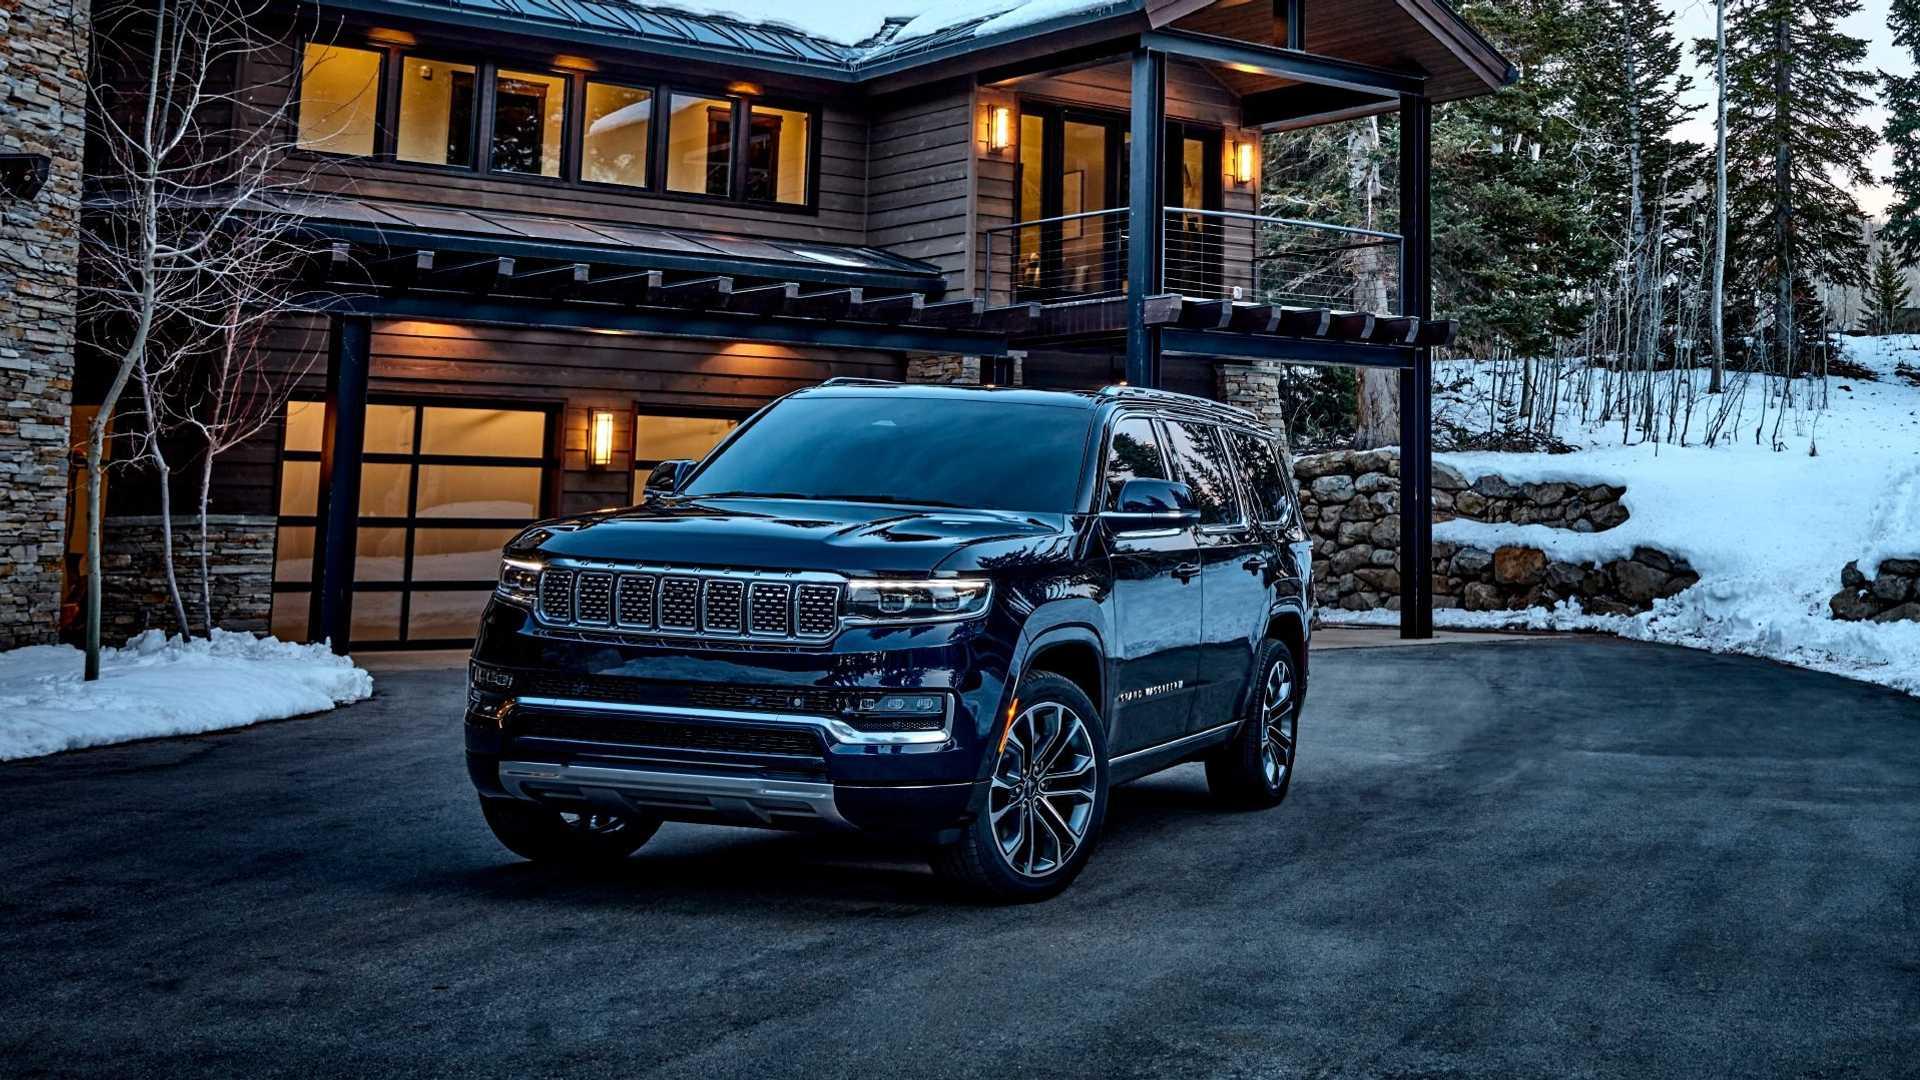 2022-jeep-grand-wagoneer-exterior-front-quarter-2